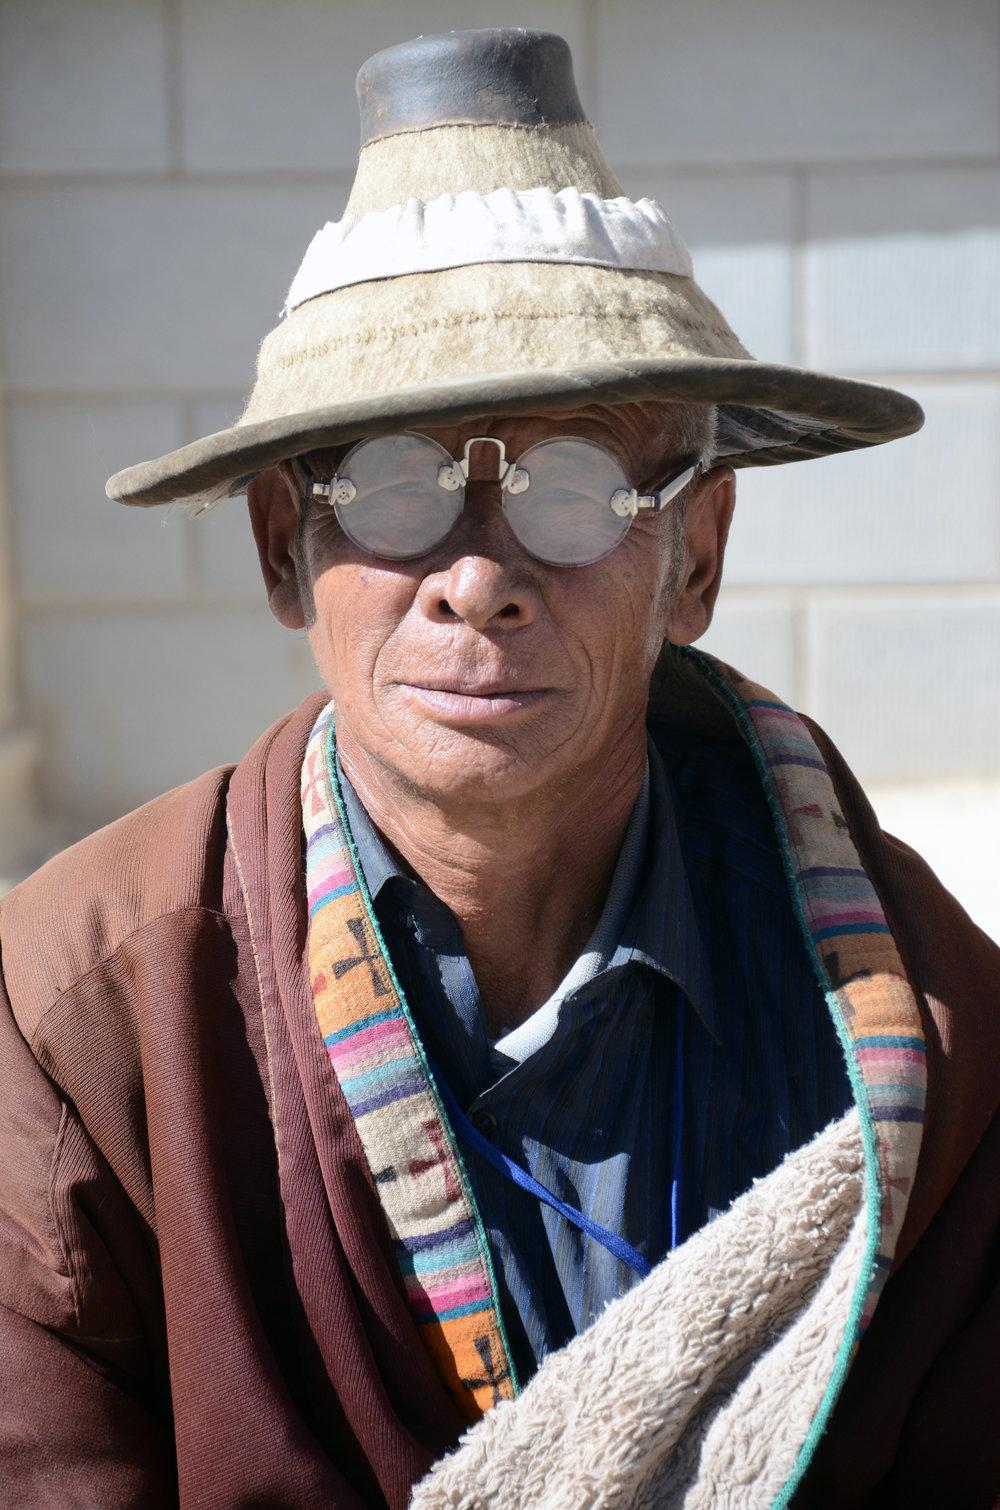 tibetan-man-in-amdo-qinghai-huangnan-tibet-china.jpg